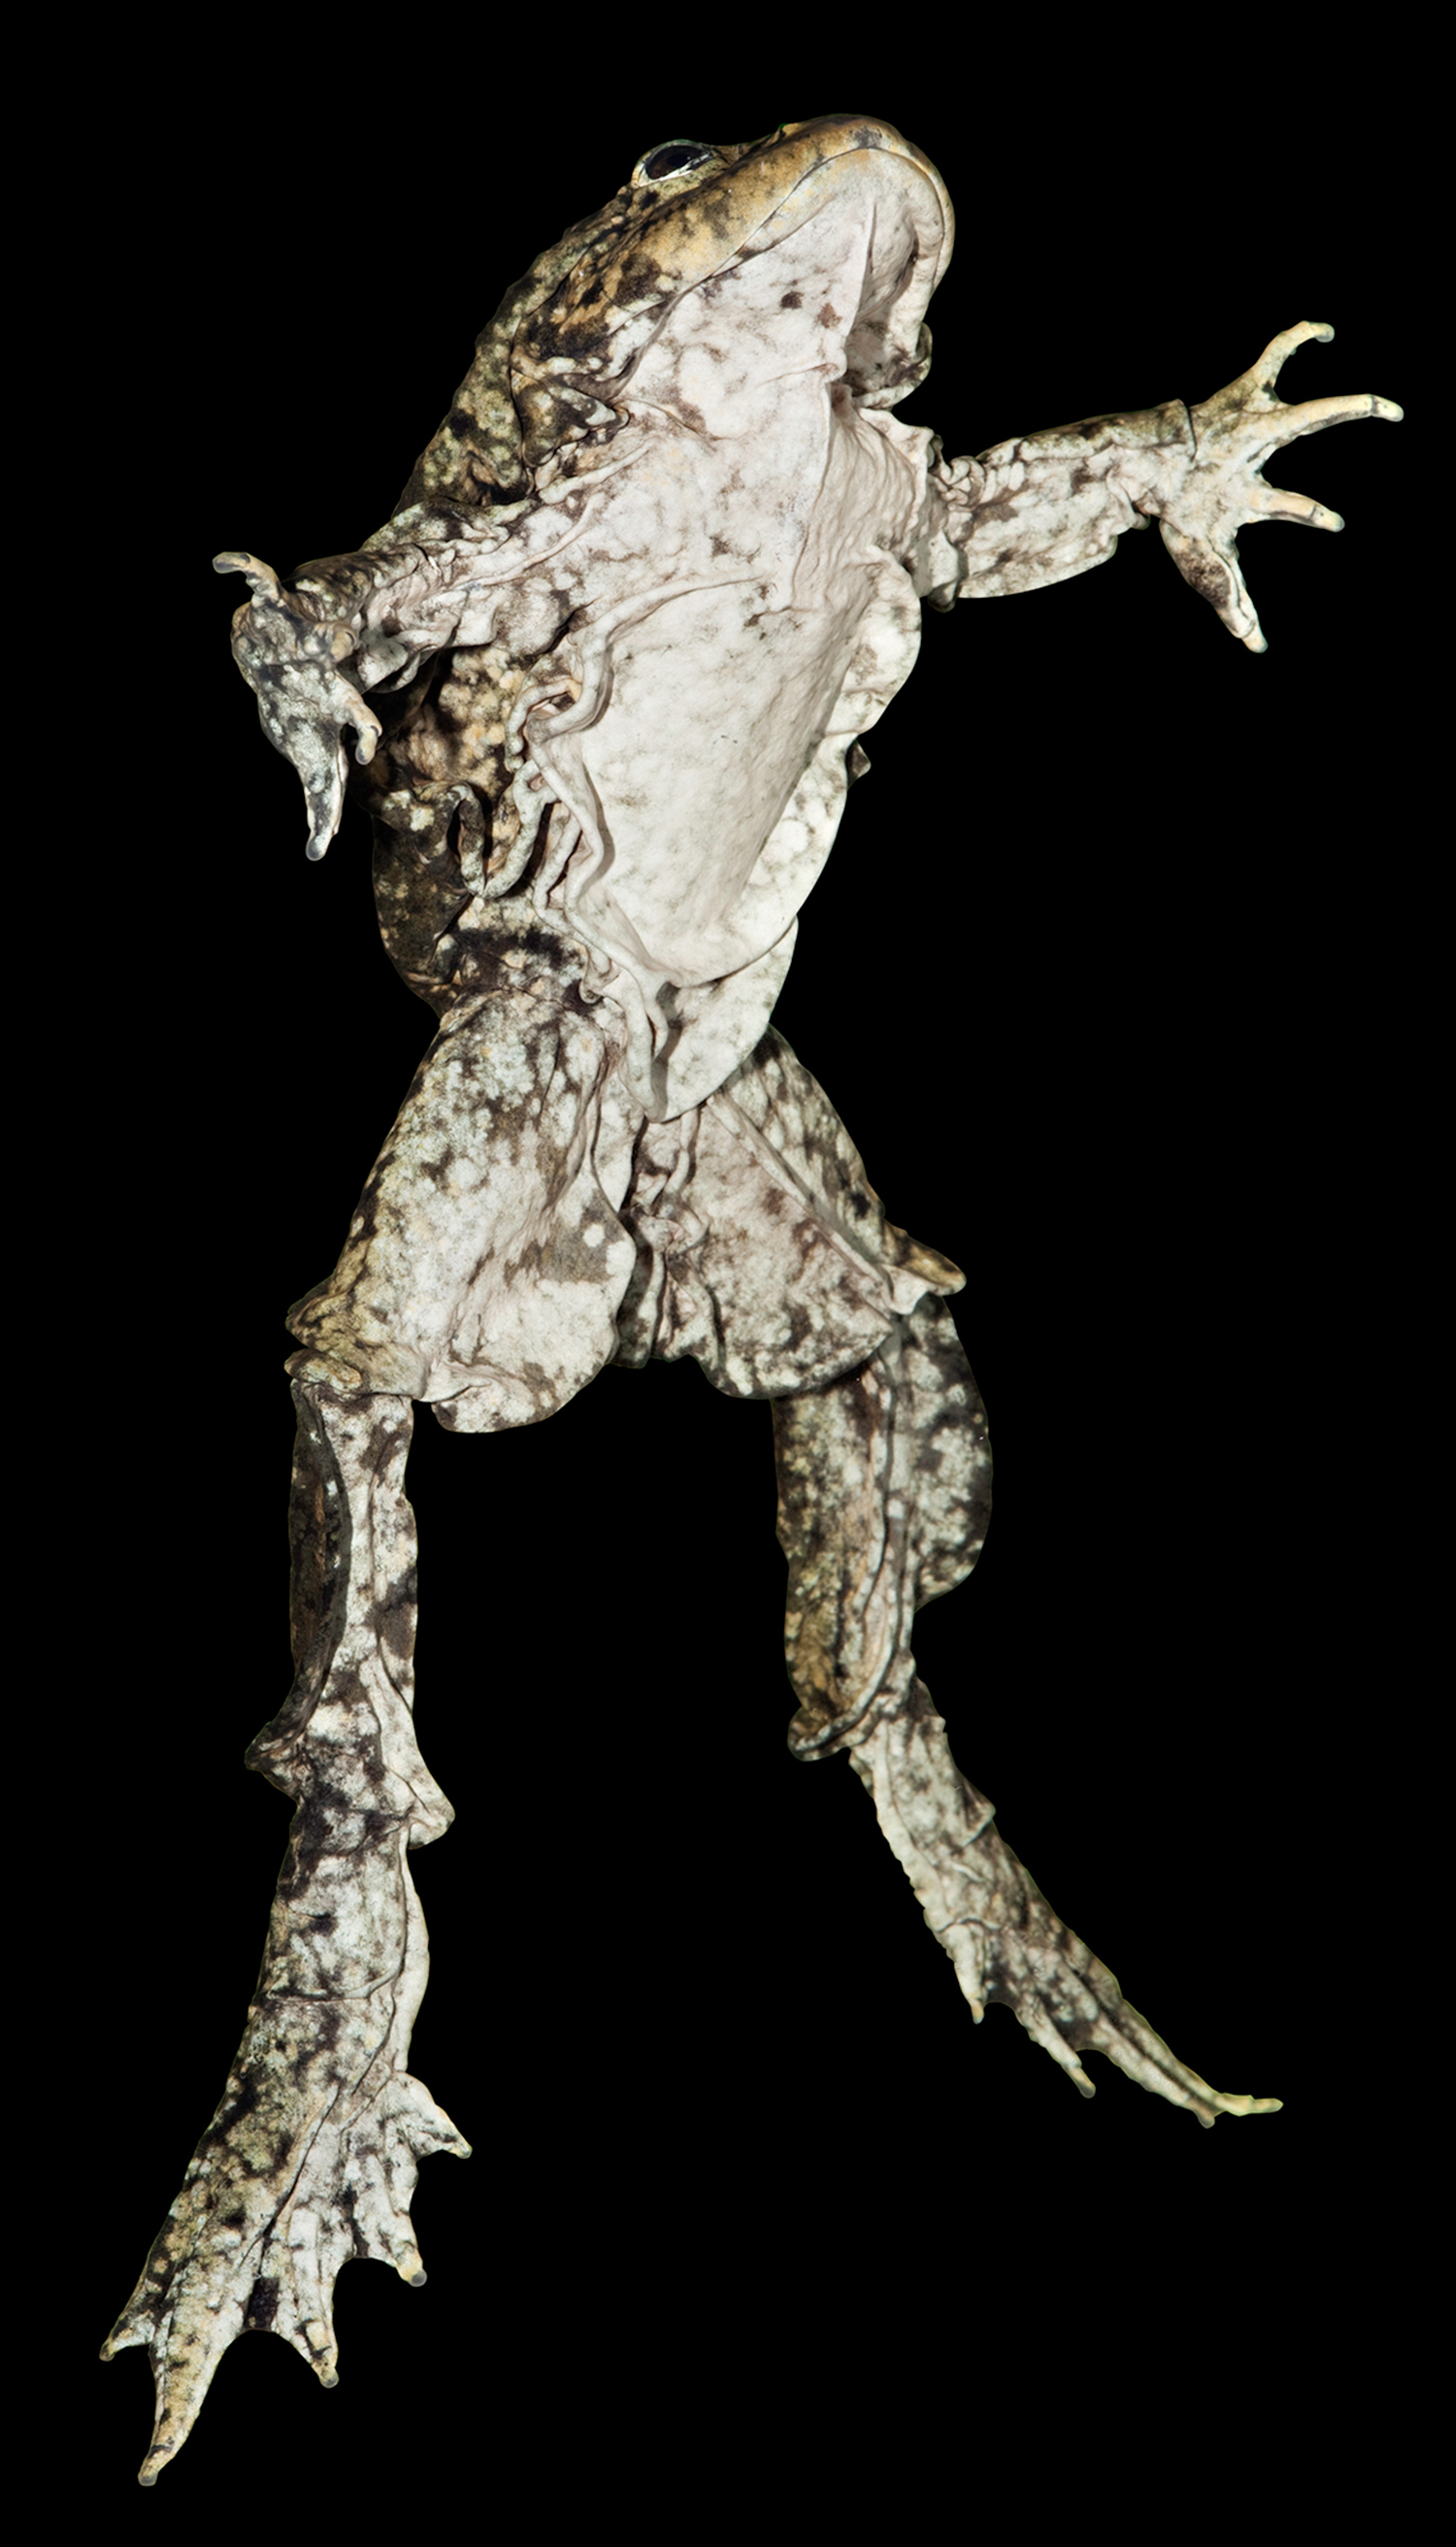 titicaca waterfrog